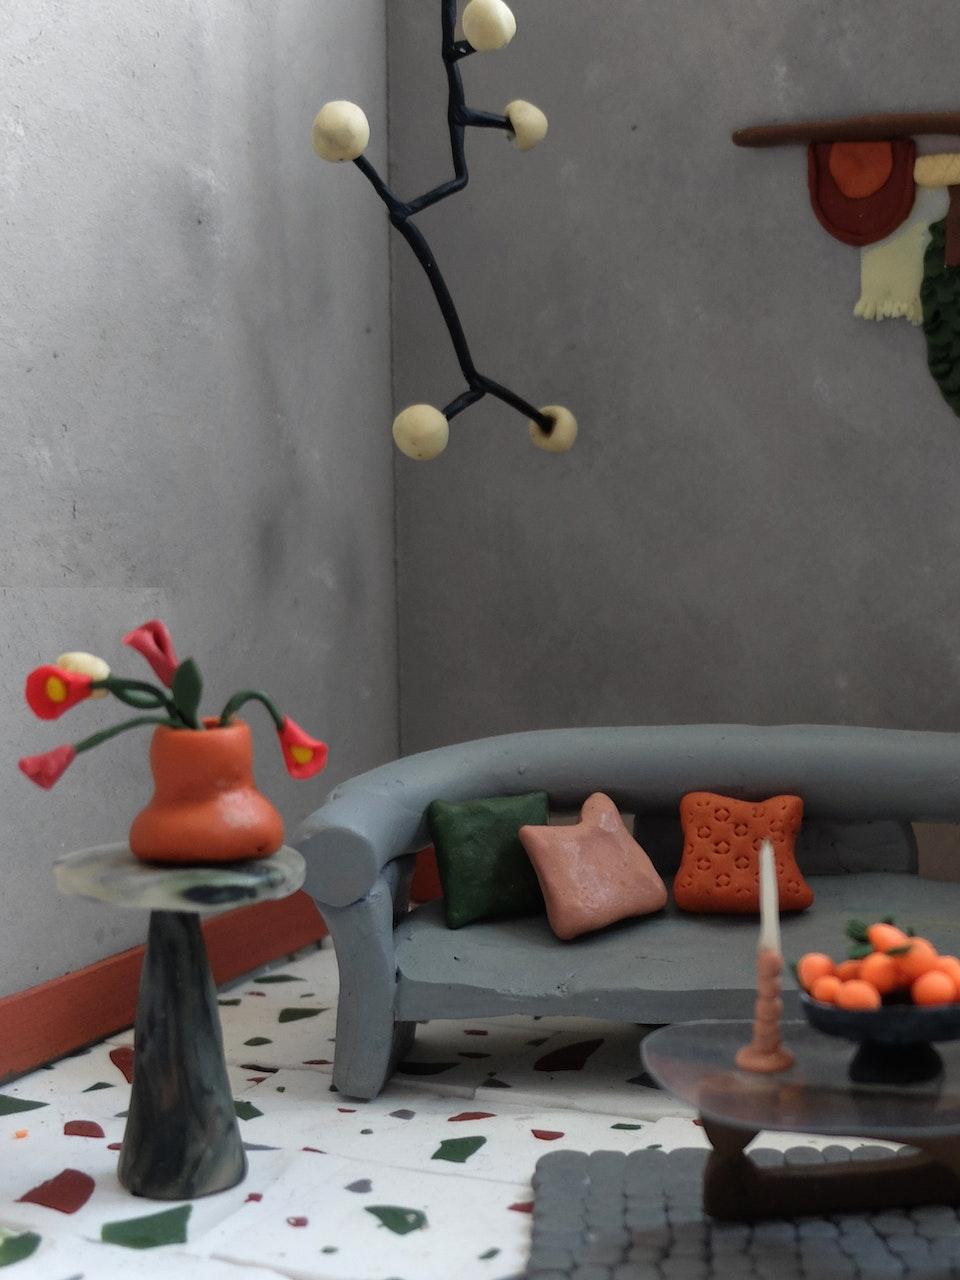 Production Designer: Phoebe Anne Harris: 'Teeny Tiny House of Clay' - DSCF8709 2